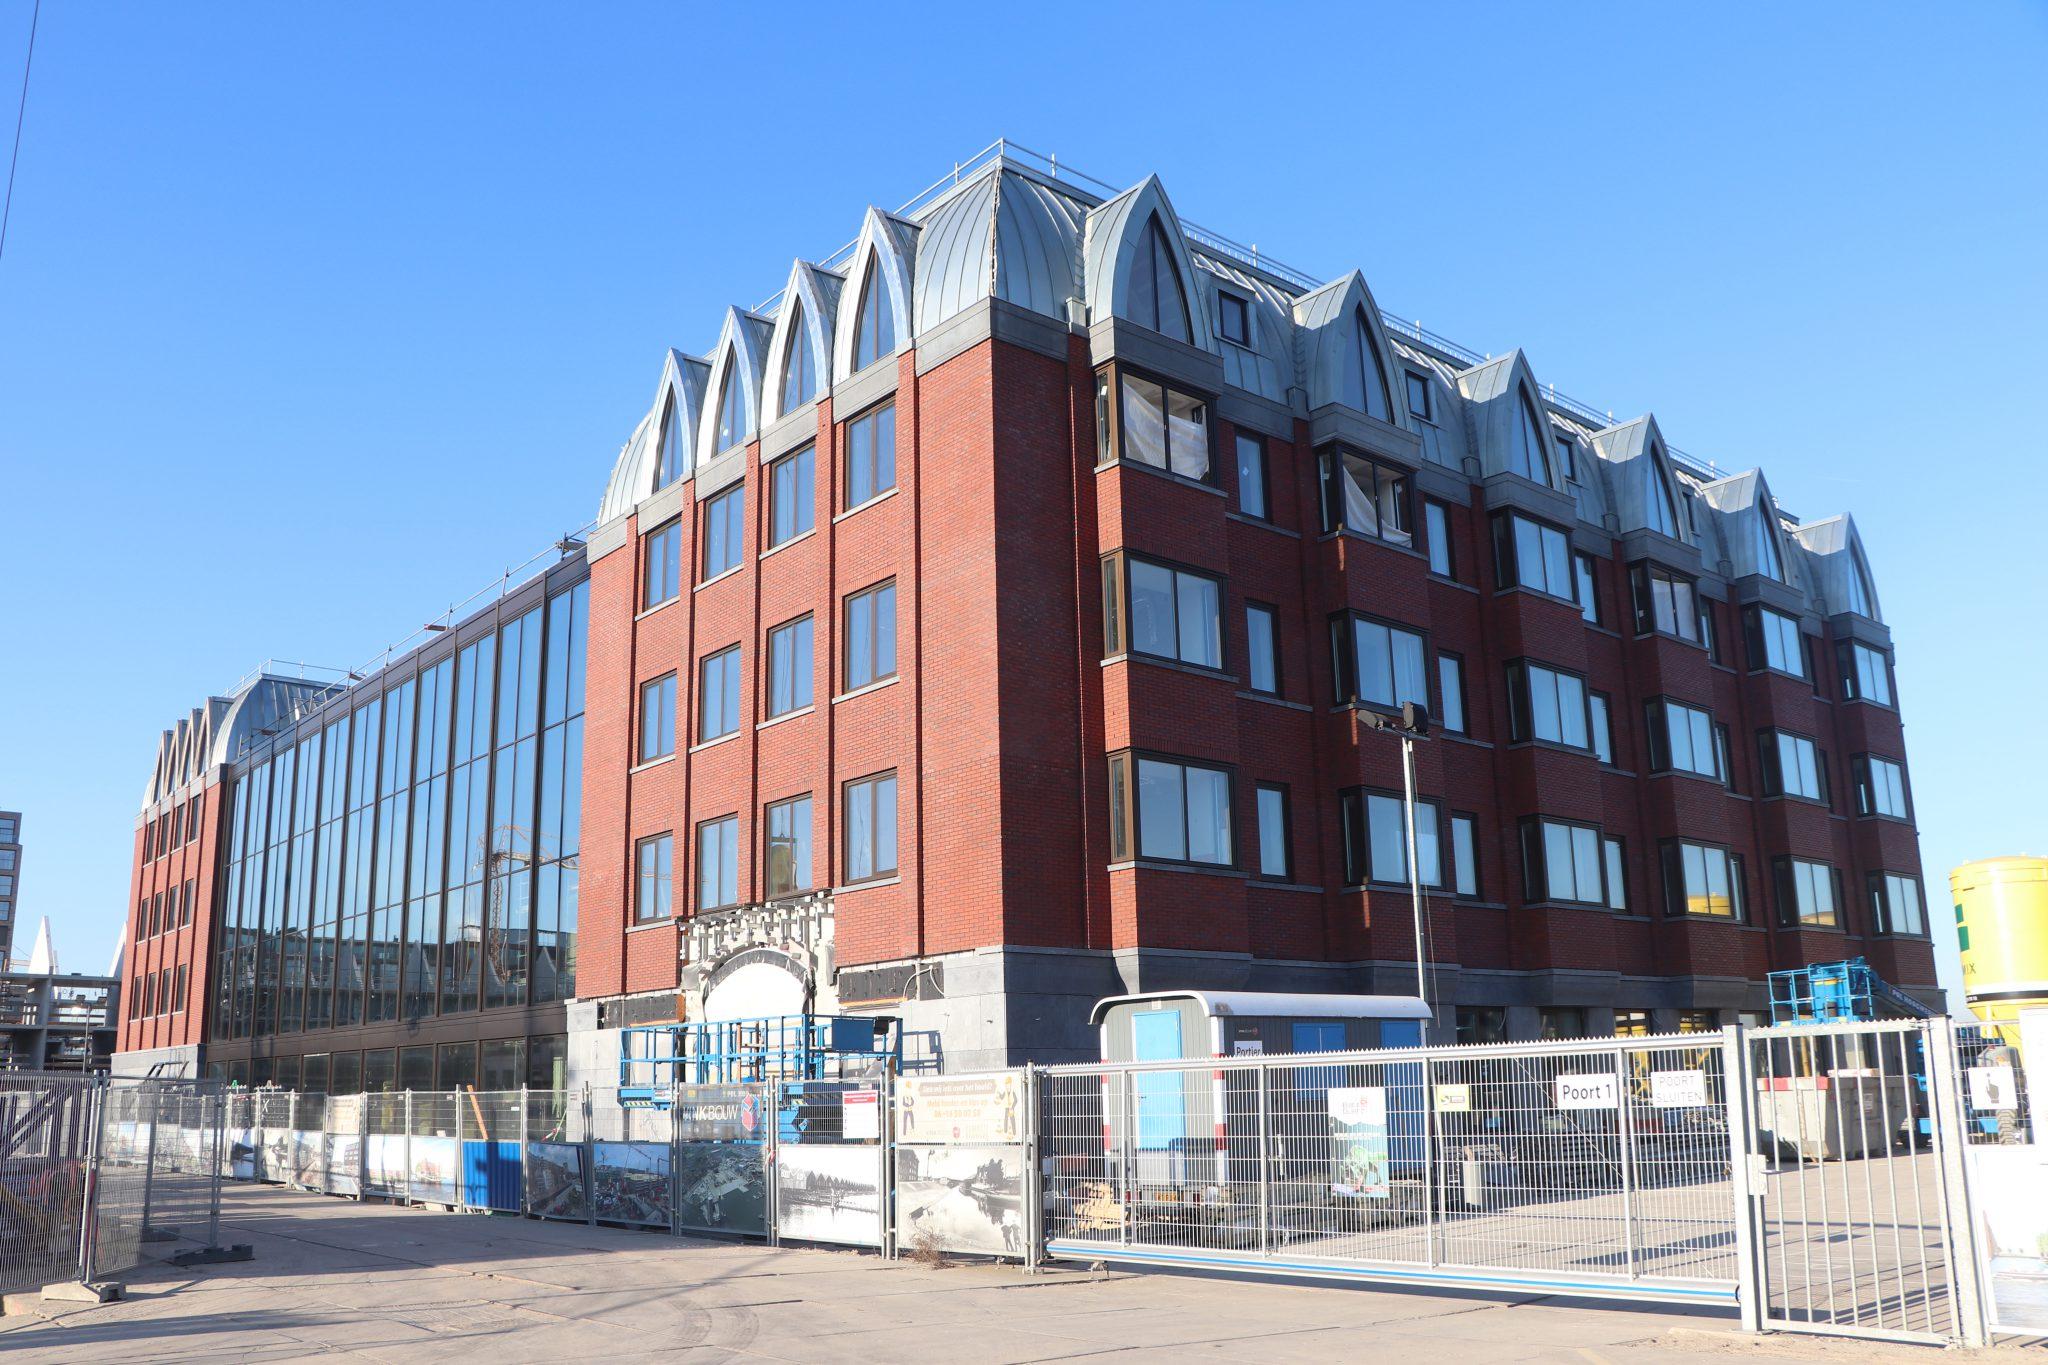 Hotel boot & Co, amsterdam, zinken dak, getoogde daken, atrium, zink